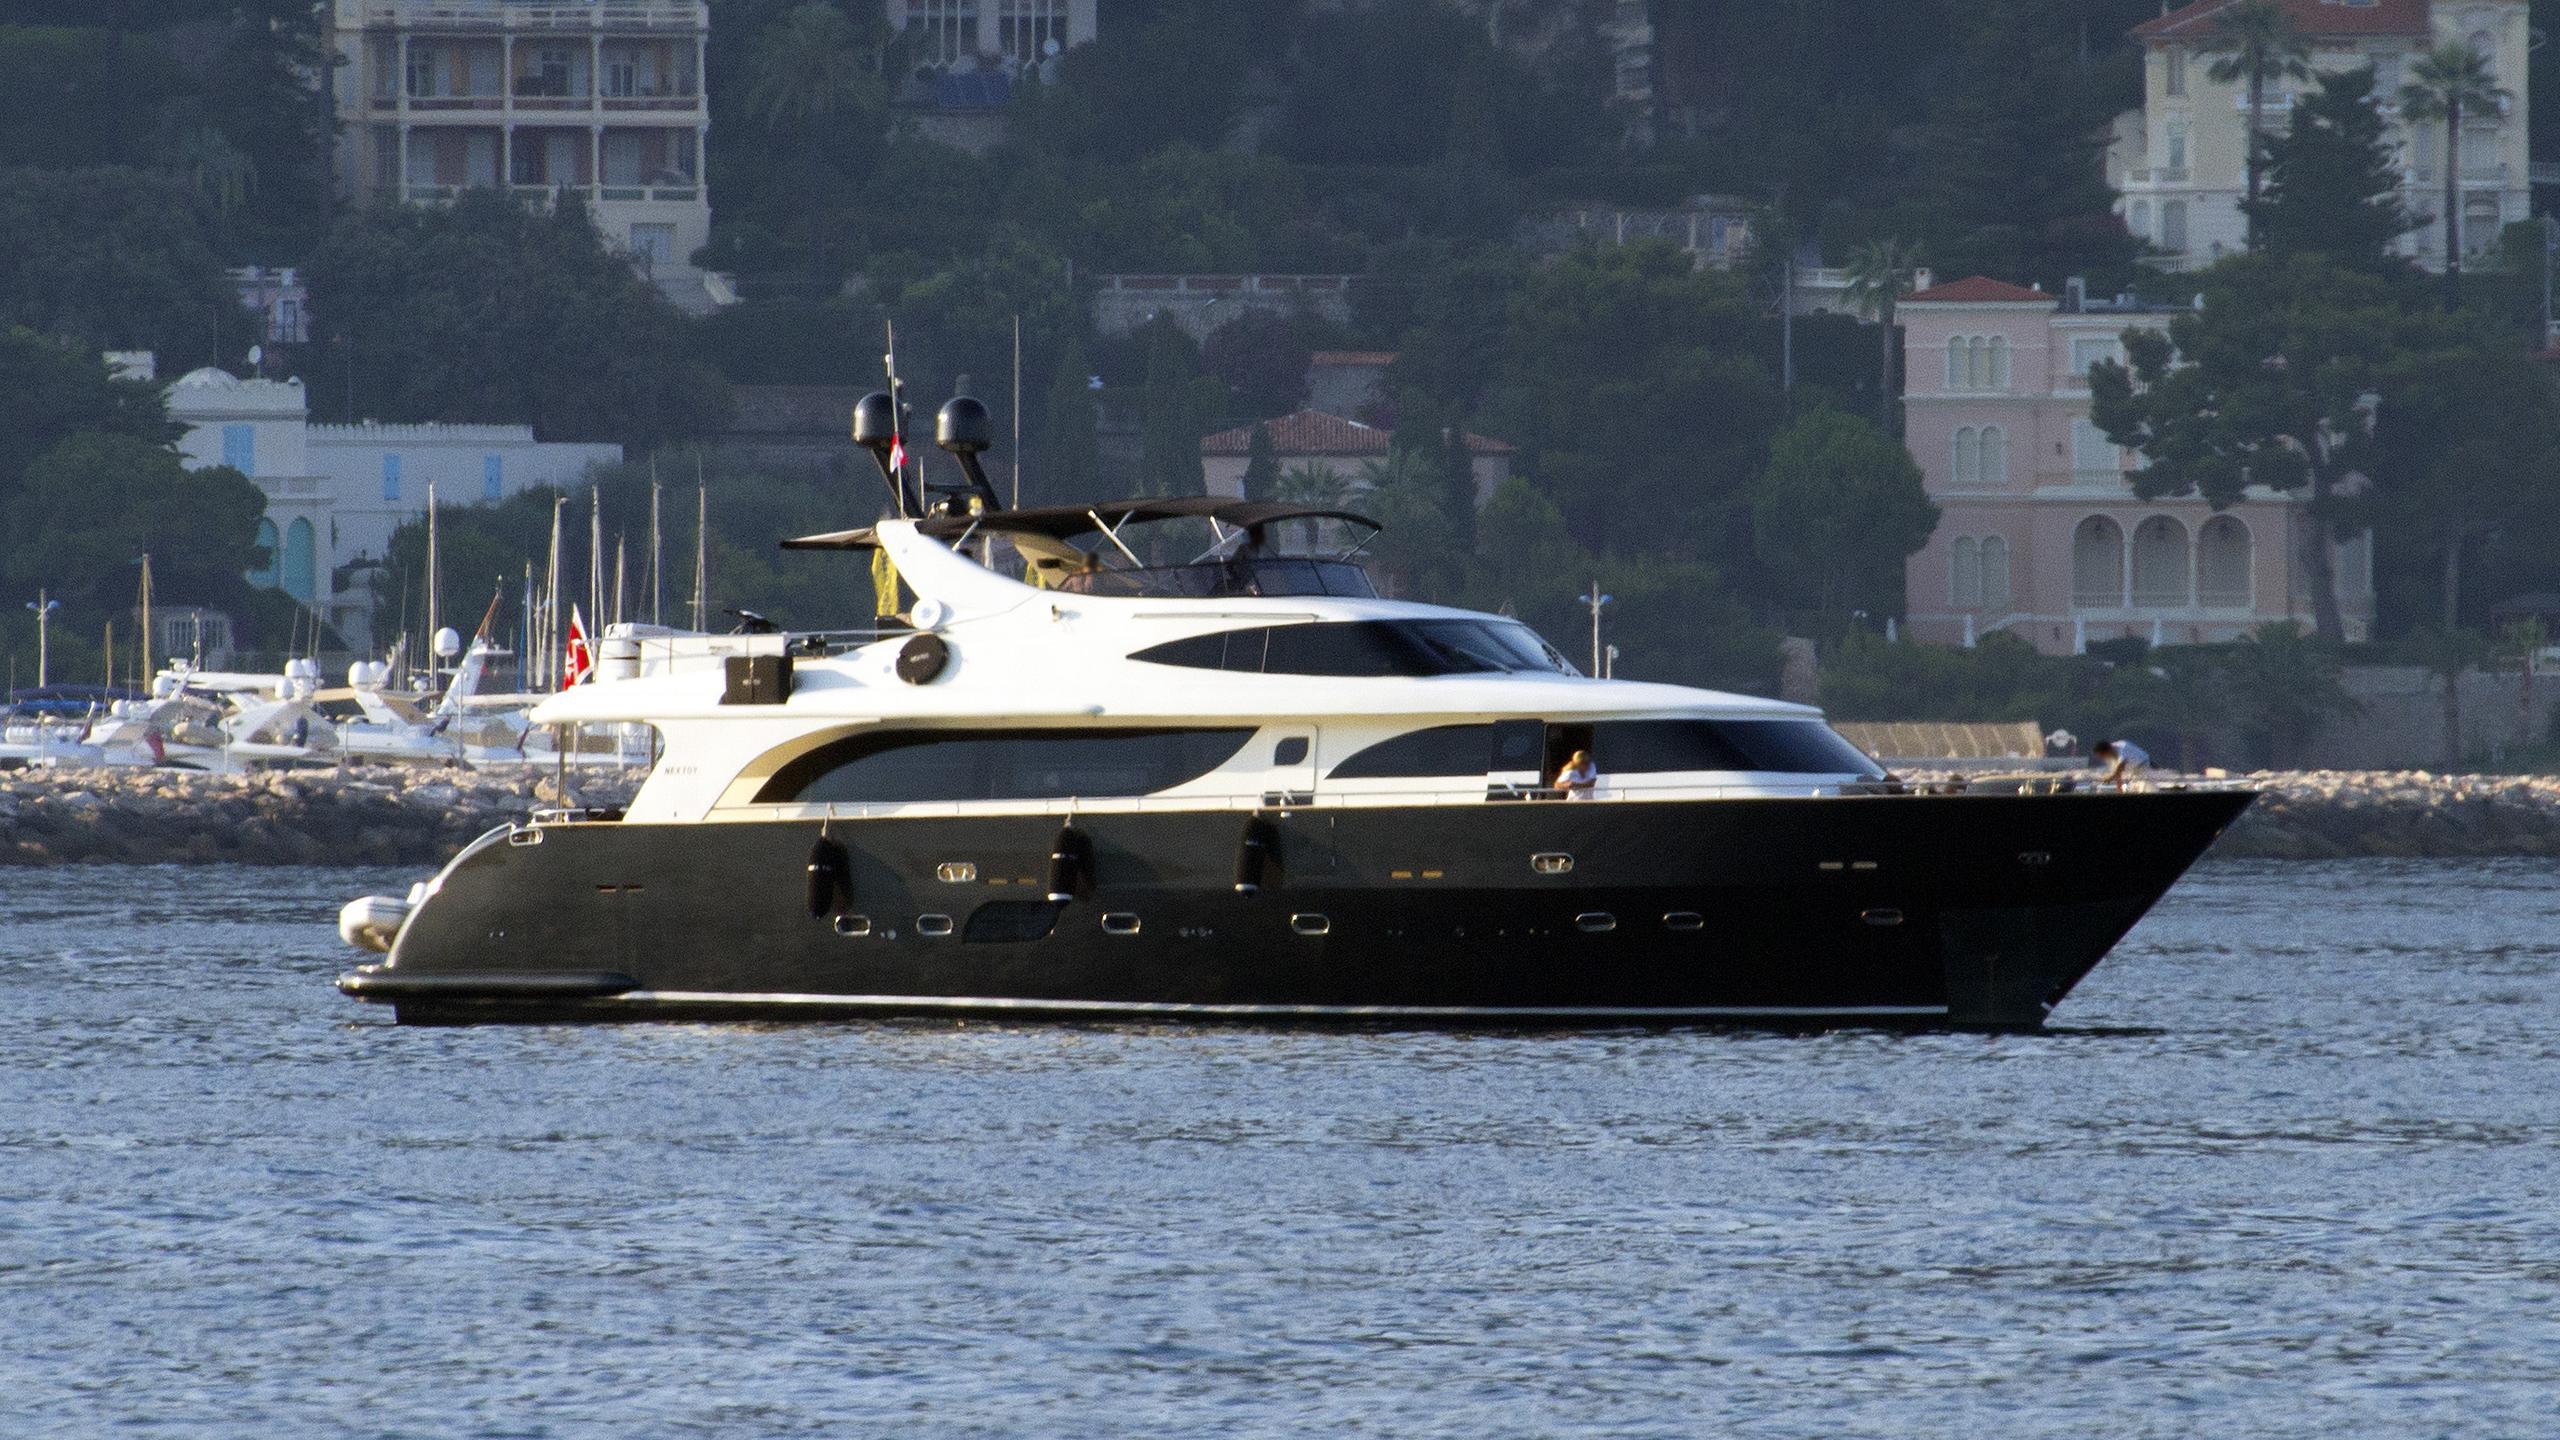 nextoy-motoryacht-gianetti-g85-2007-26m-profile